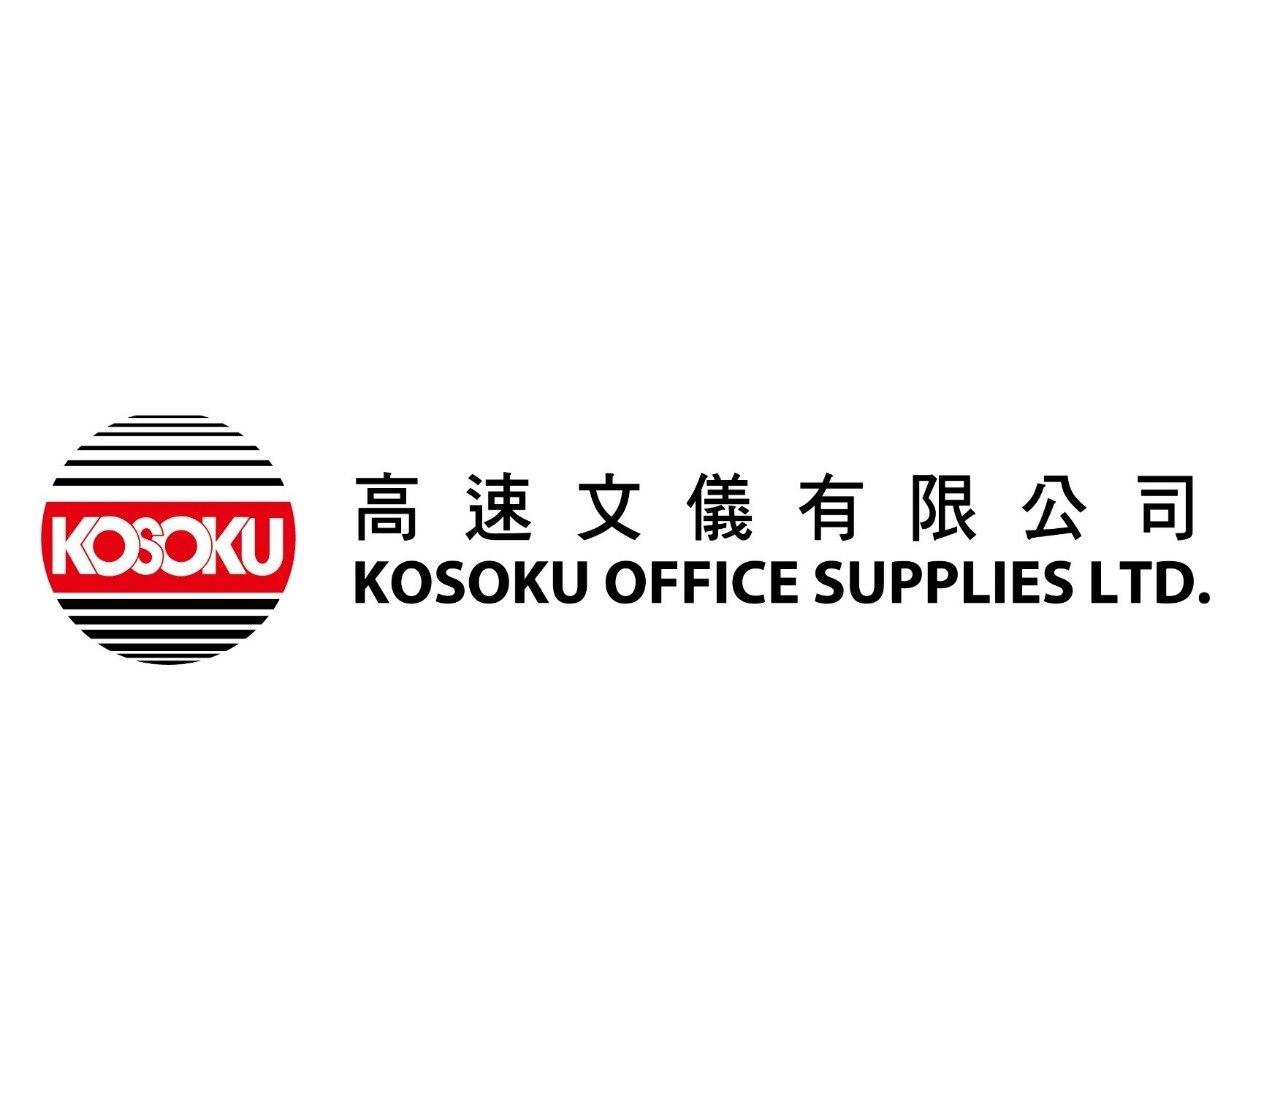 高速文儀有限公司 KOSOKU OFFICE SUPPLIES LTD. 公戸  Font,Logo,Graphics,